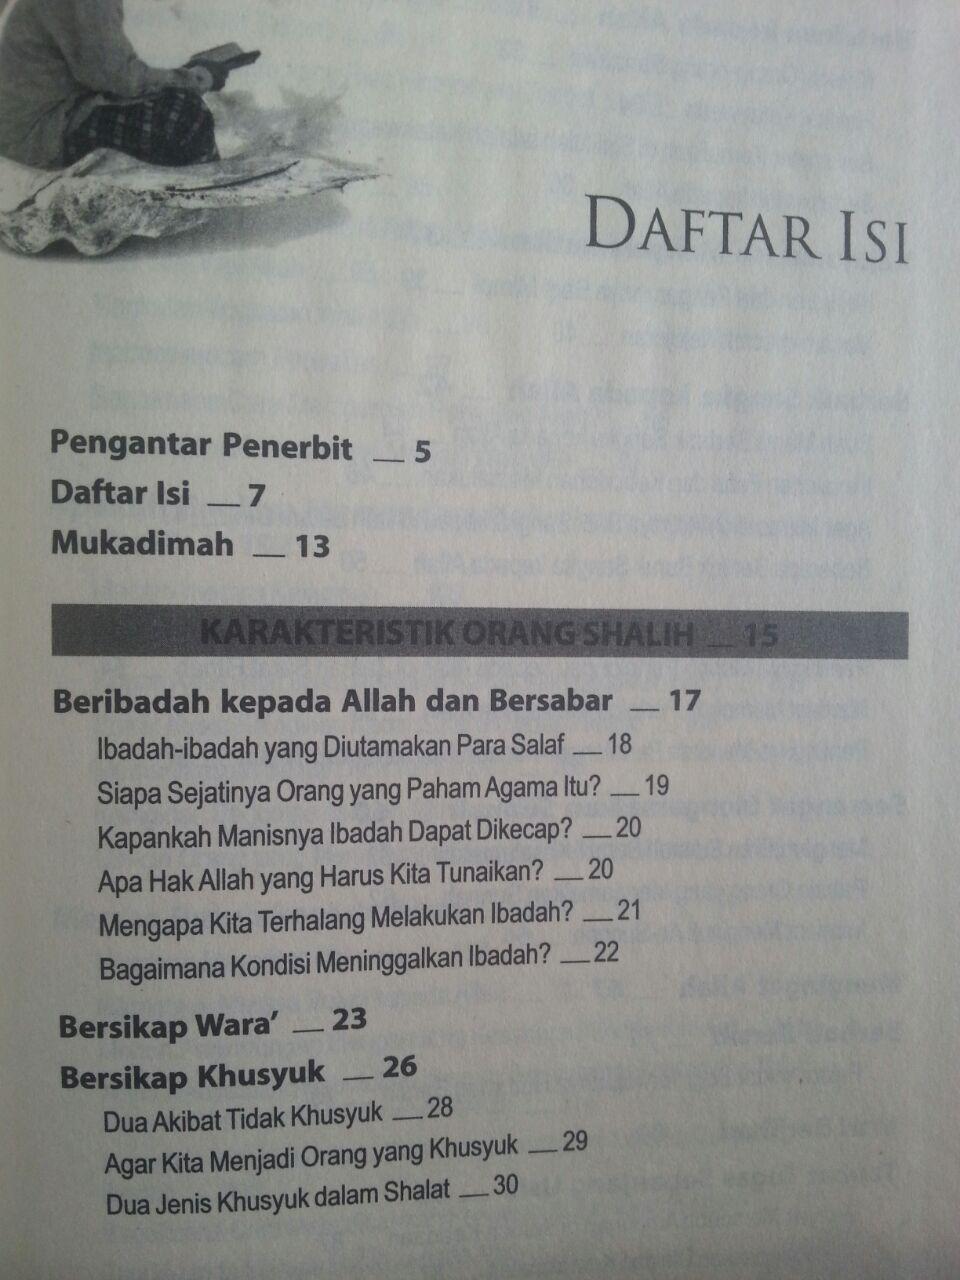 Buku Karakter Rajulun Shalih Kepribadian Menurut Quran Sunnah isi 2